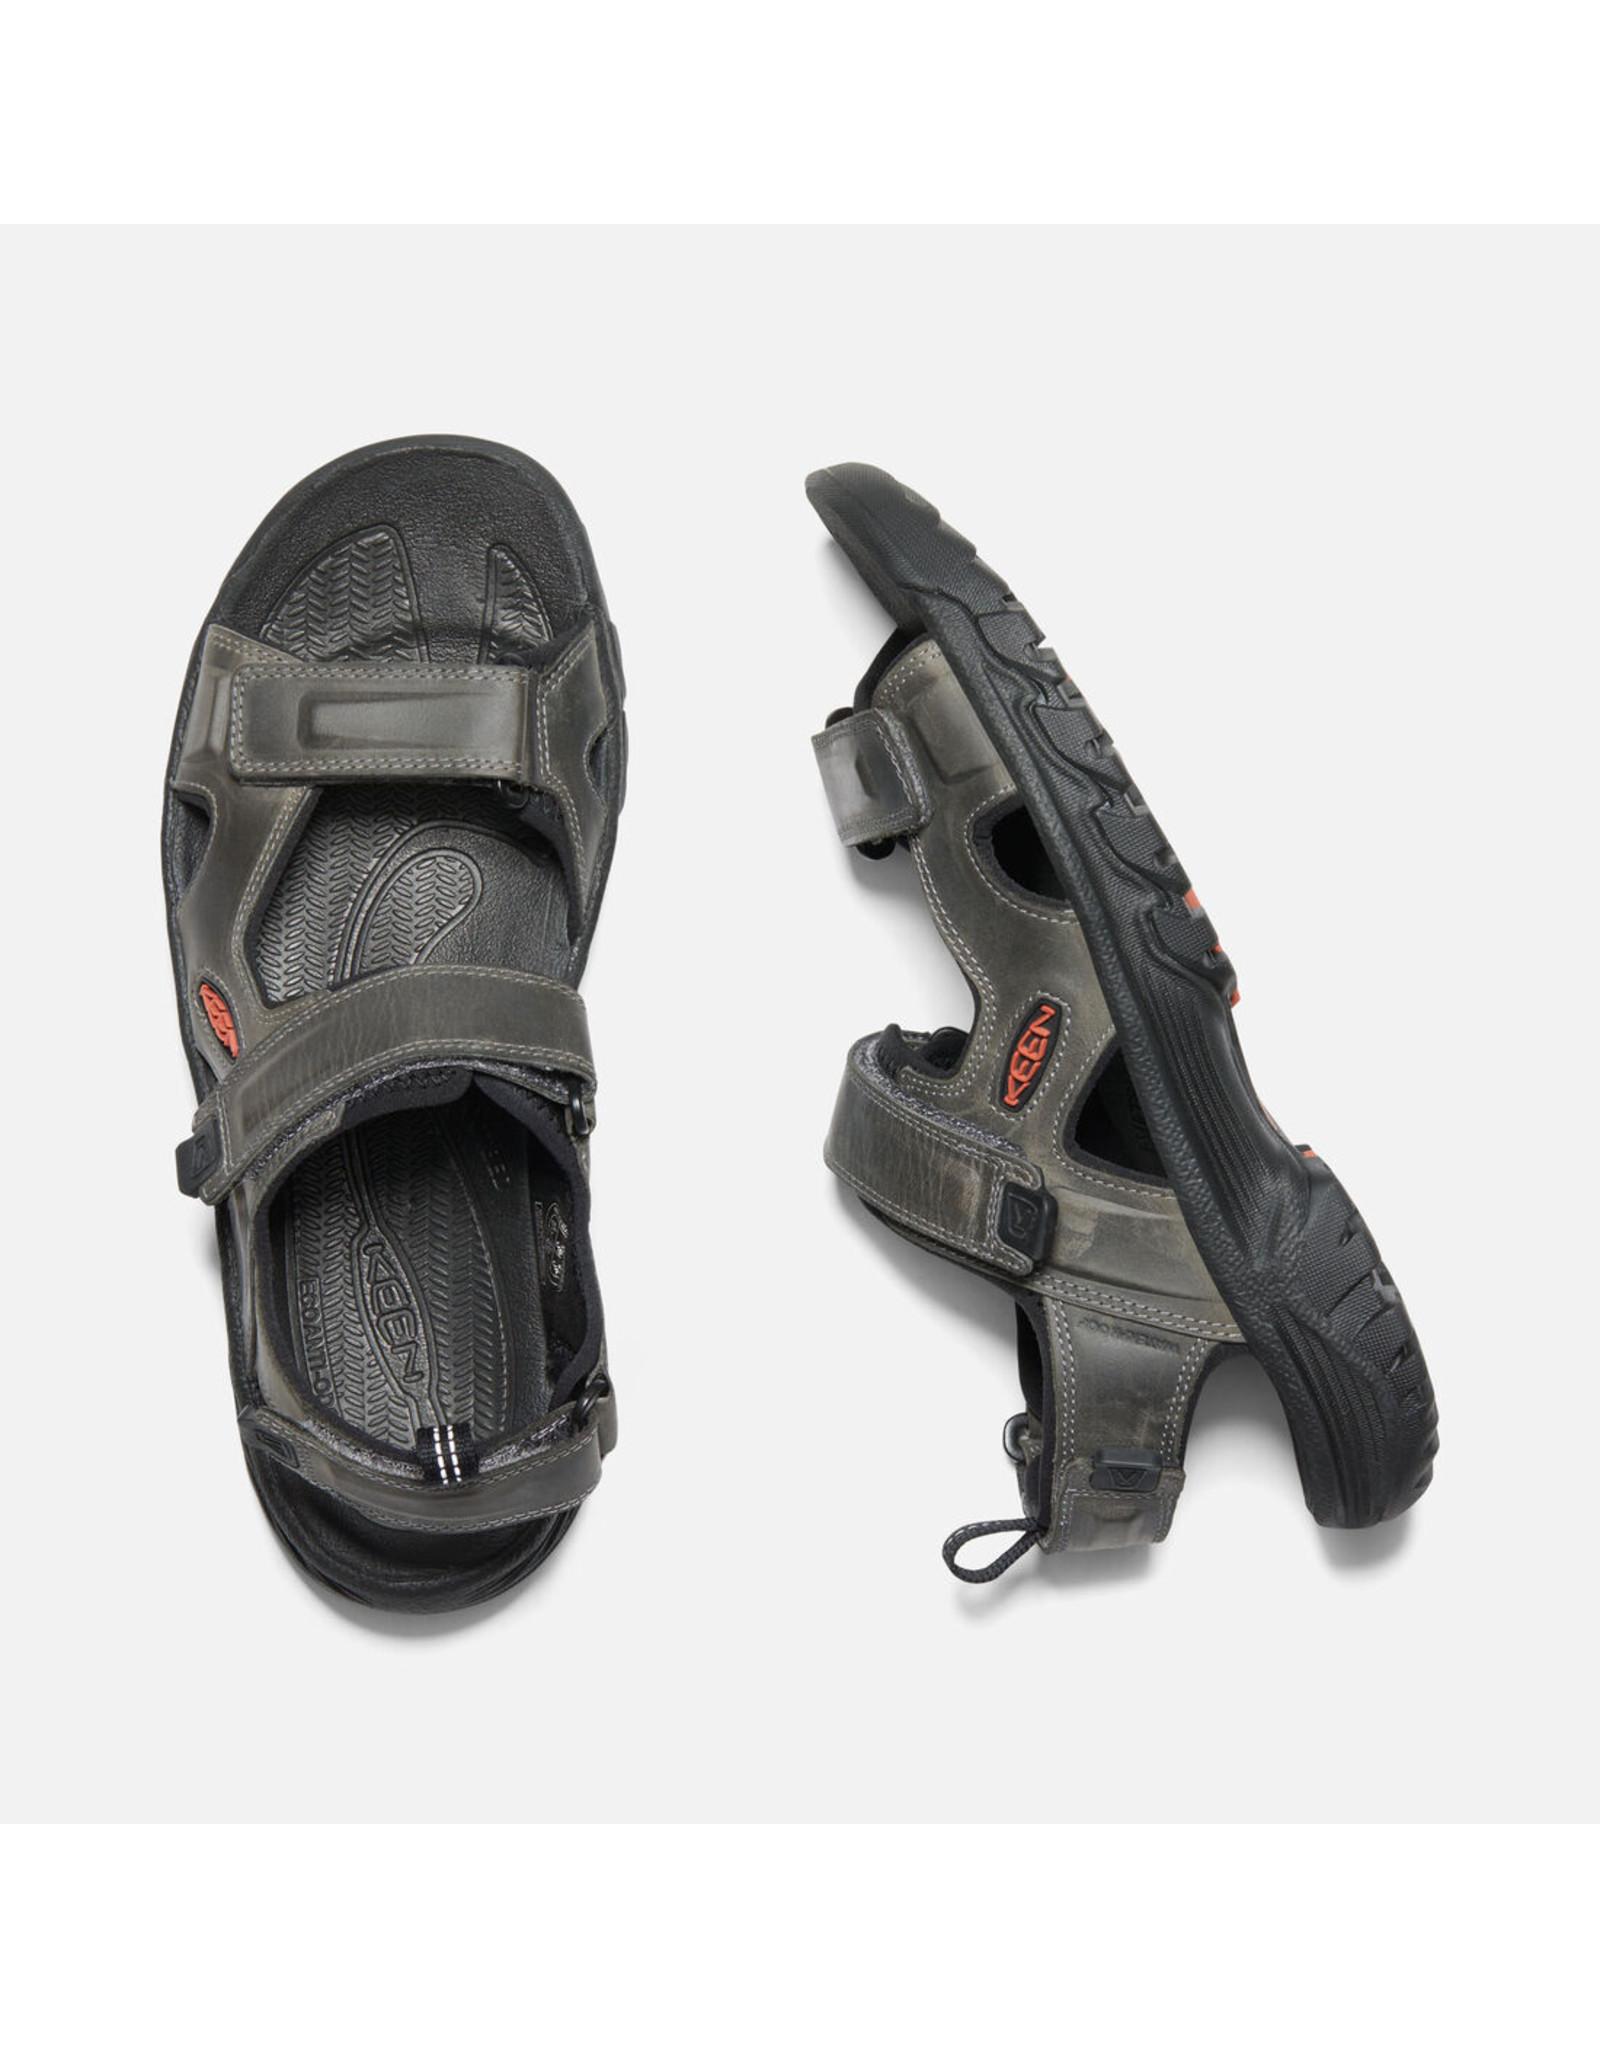 Keen Men's Targhee III Sandal - 20ps